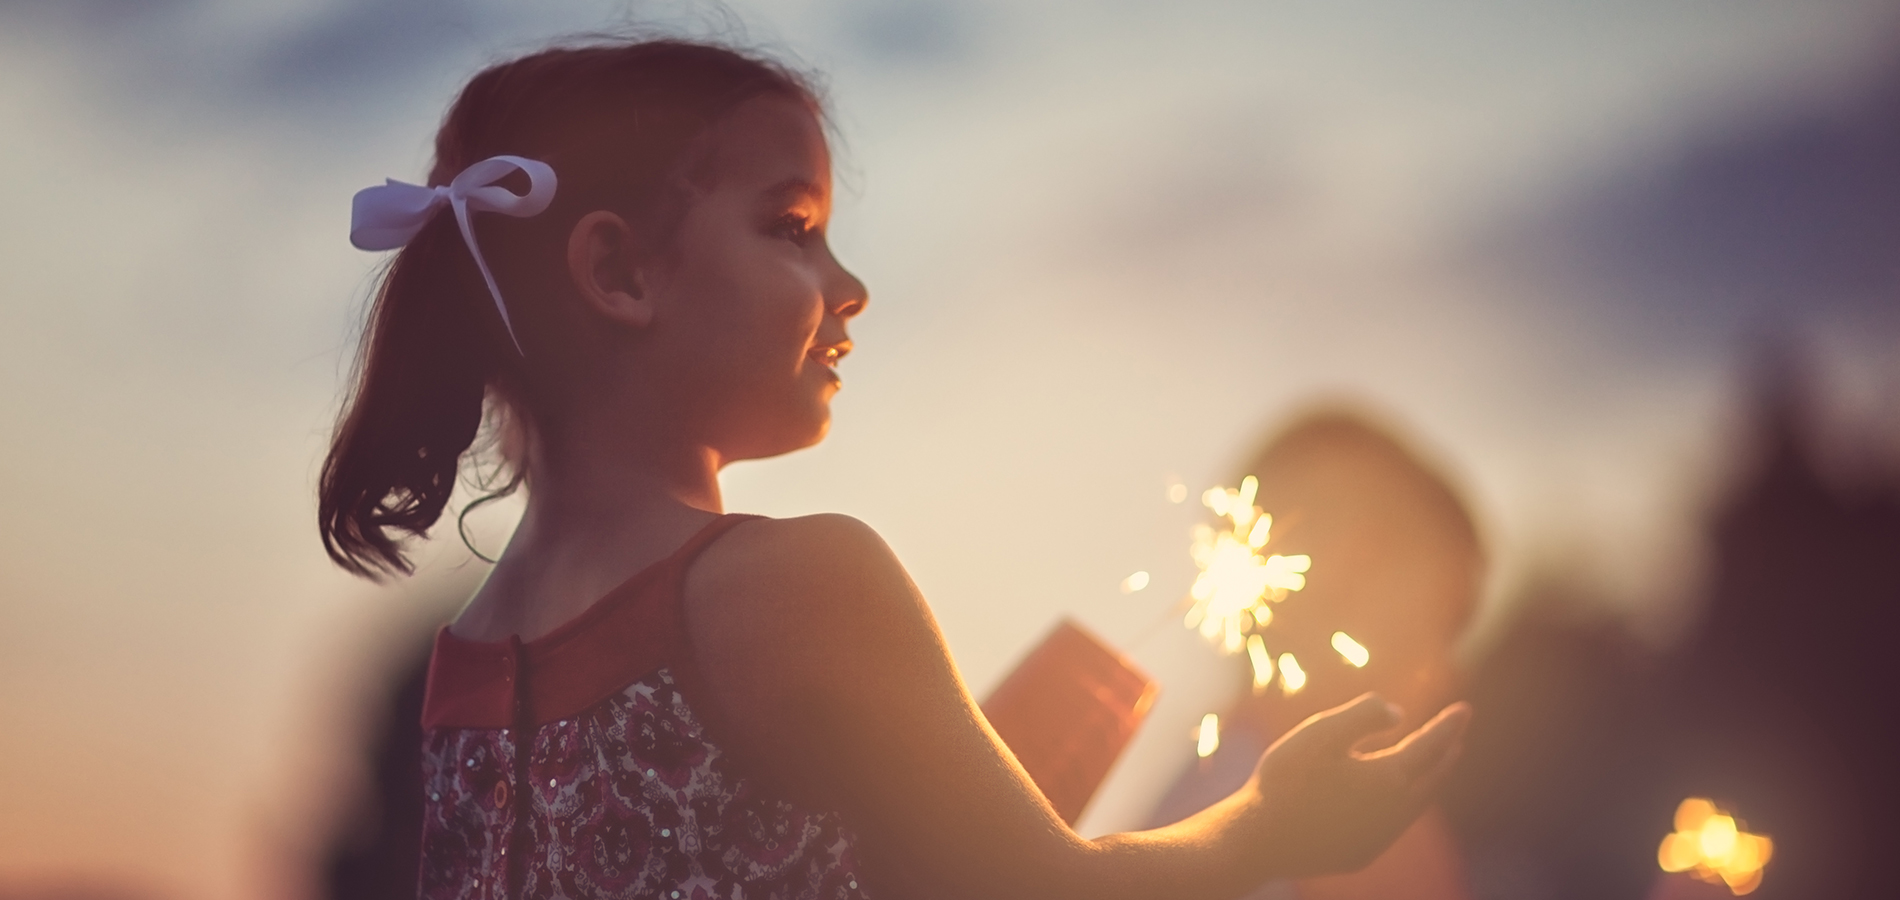 Celebrate independence safely